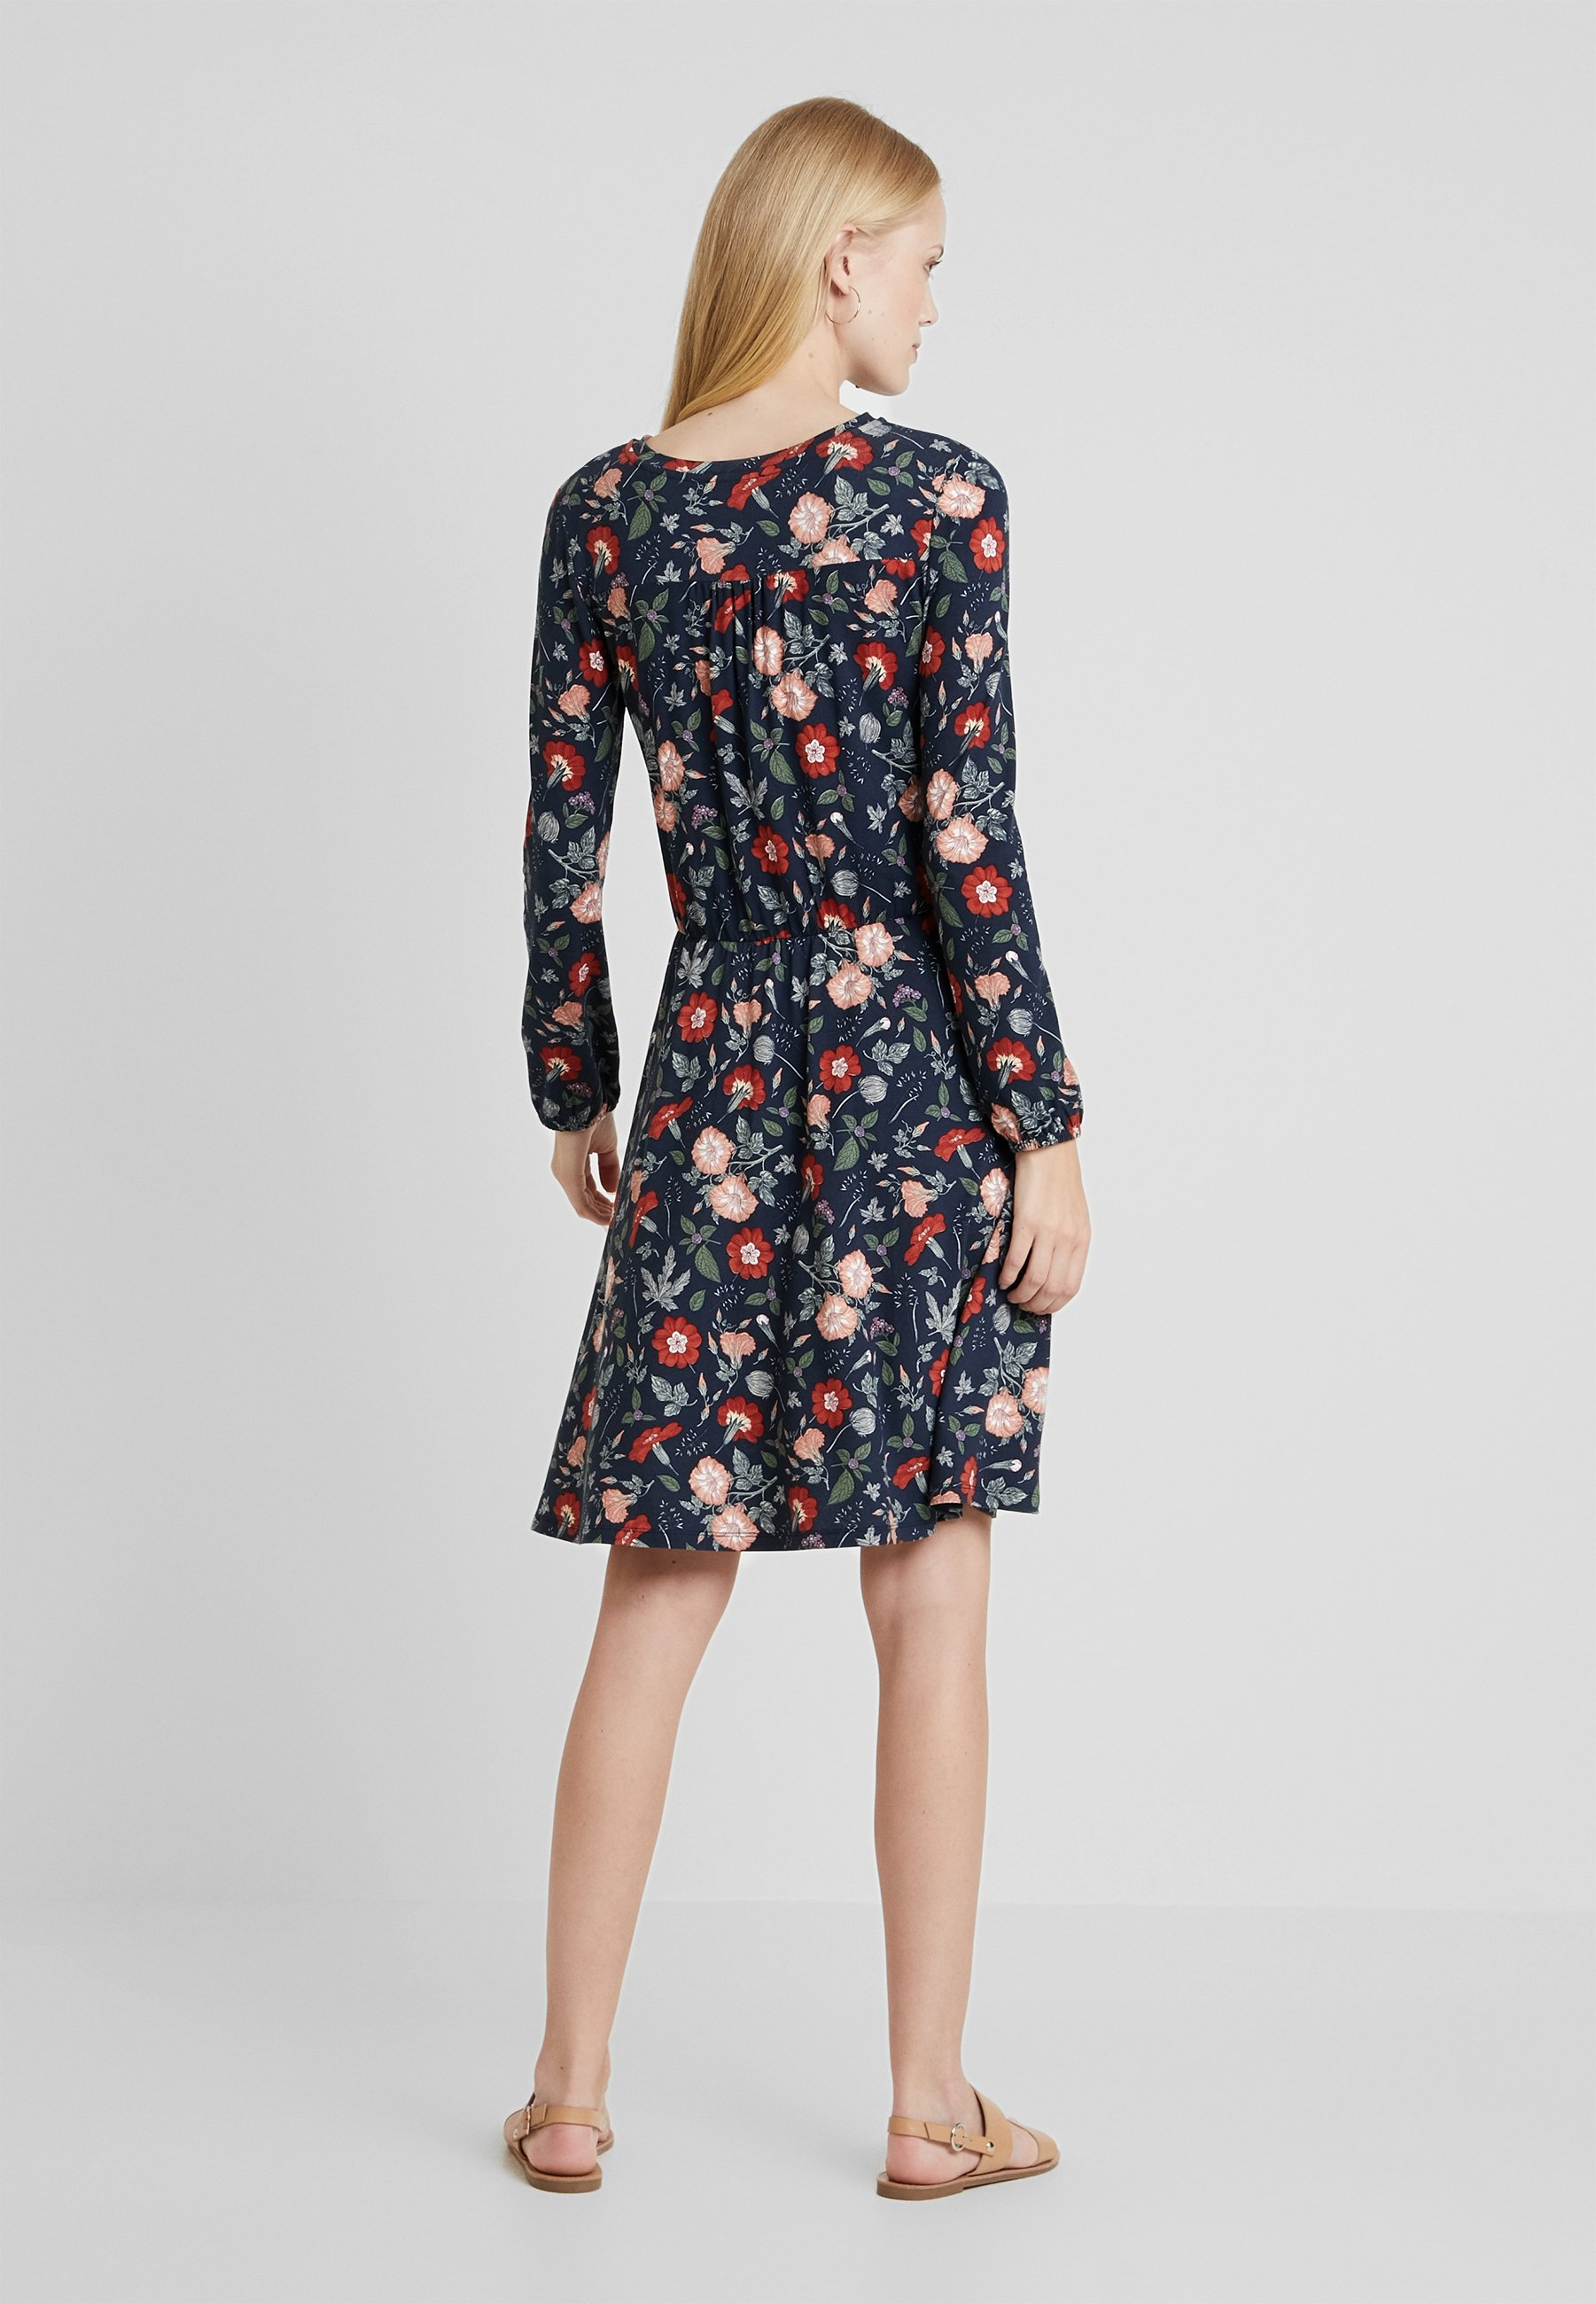 DressRobe Jean By Printed Esprit En Edc Navy OuZiPXTk